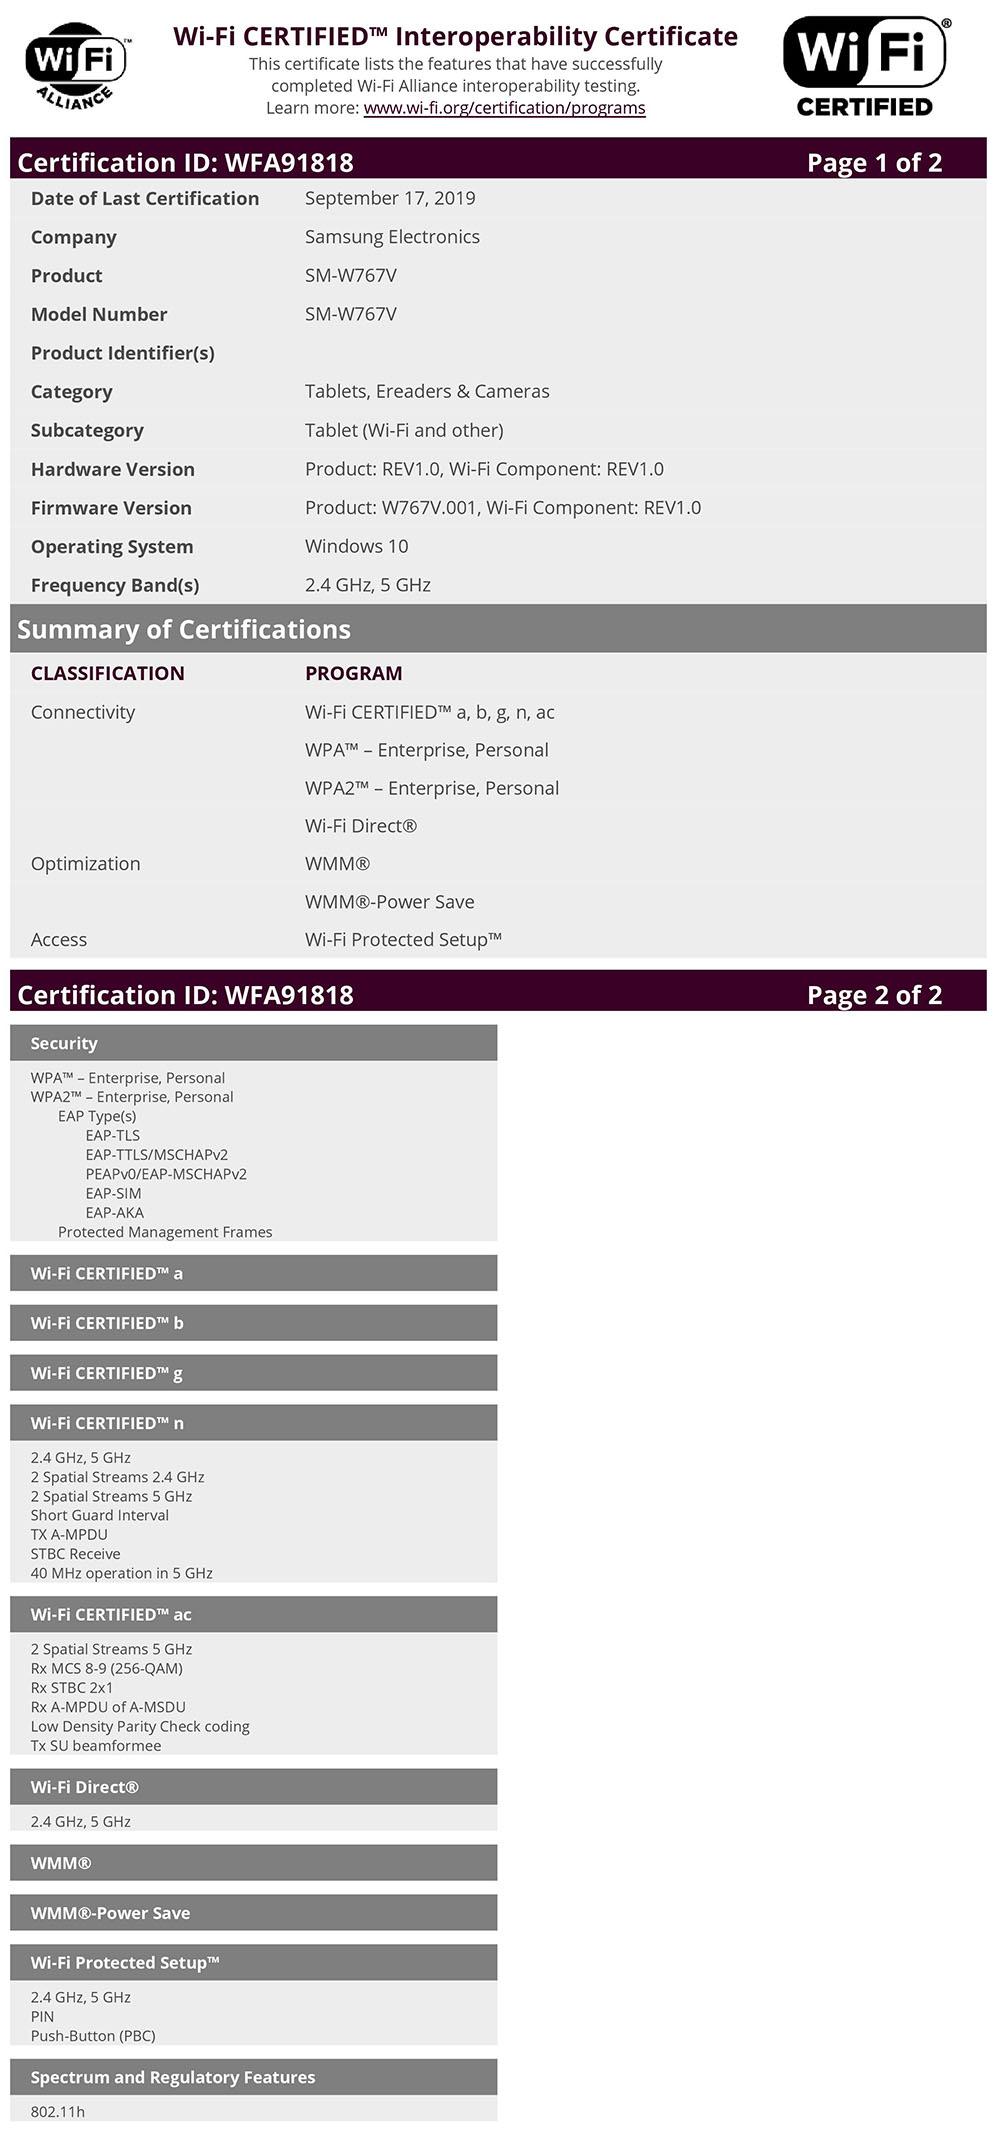 Samsung SM-W767V Wi-Fi Certification